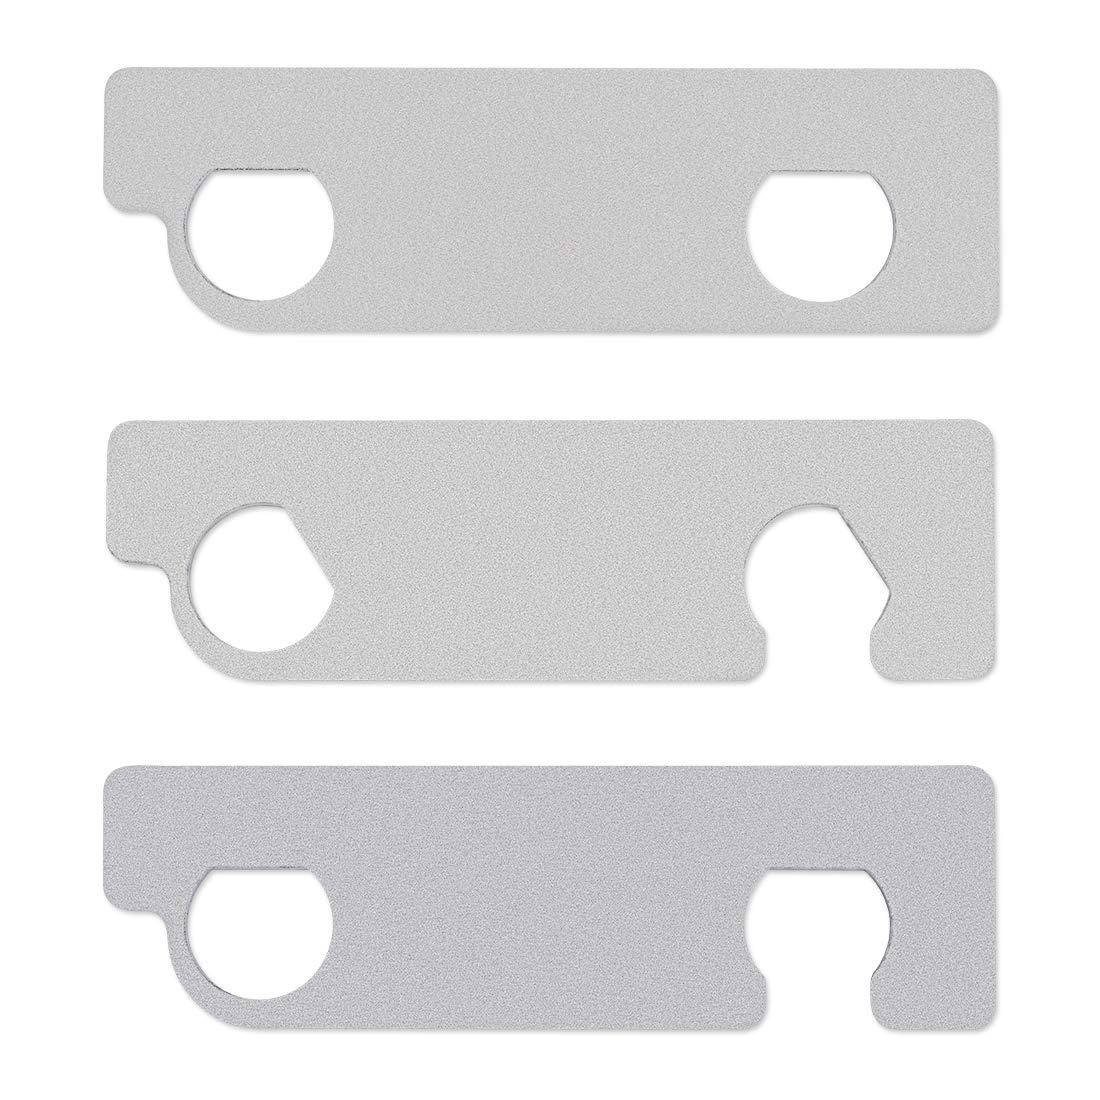 Camshaft Retaining Tool EN48383 EN46105 for Vauxhall/Opel/Saab/Cadillac/Buick/Chevrolet/Pontiac Ansite